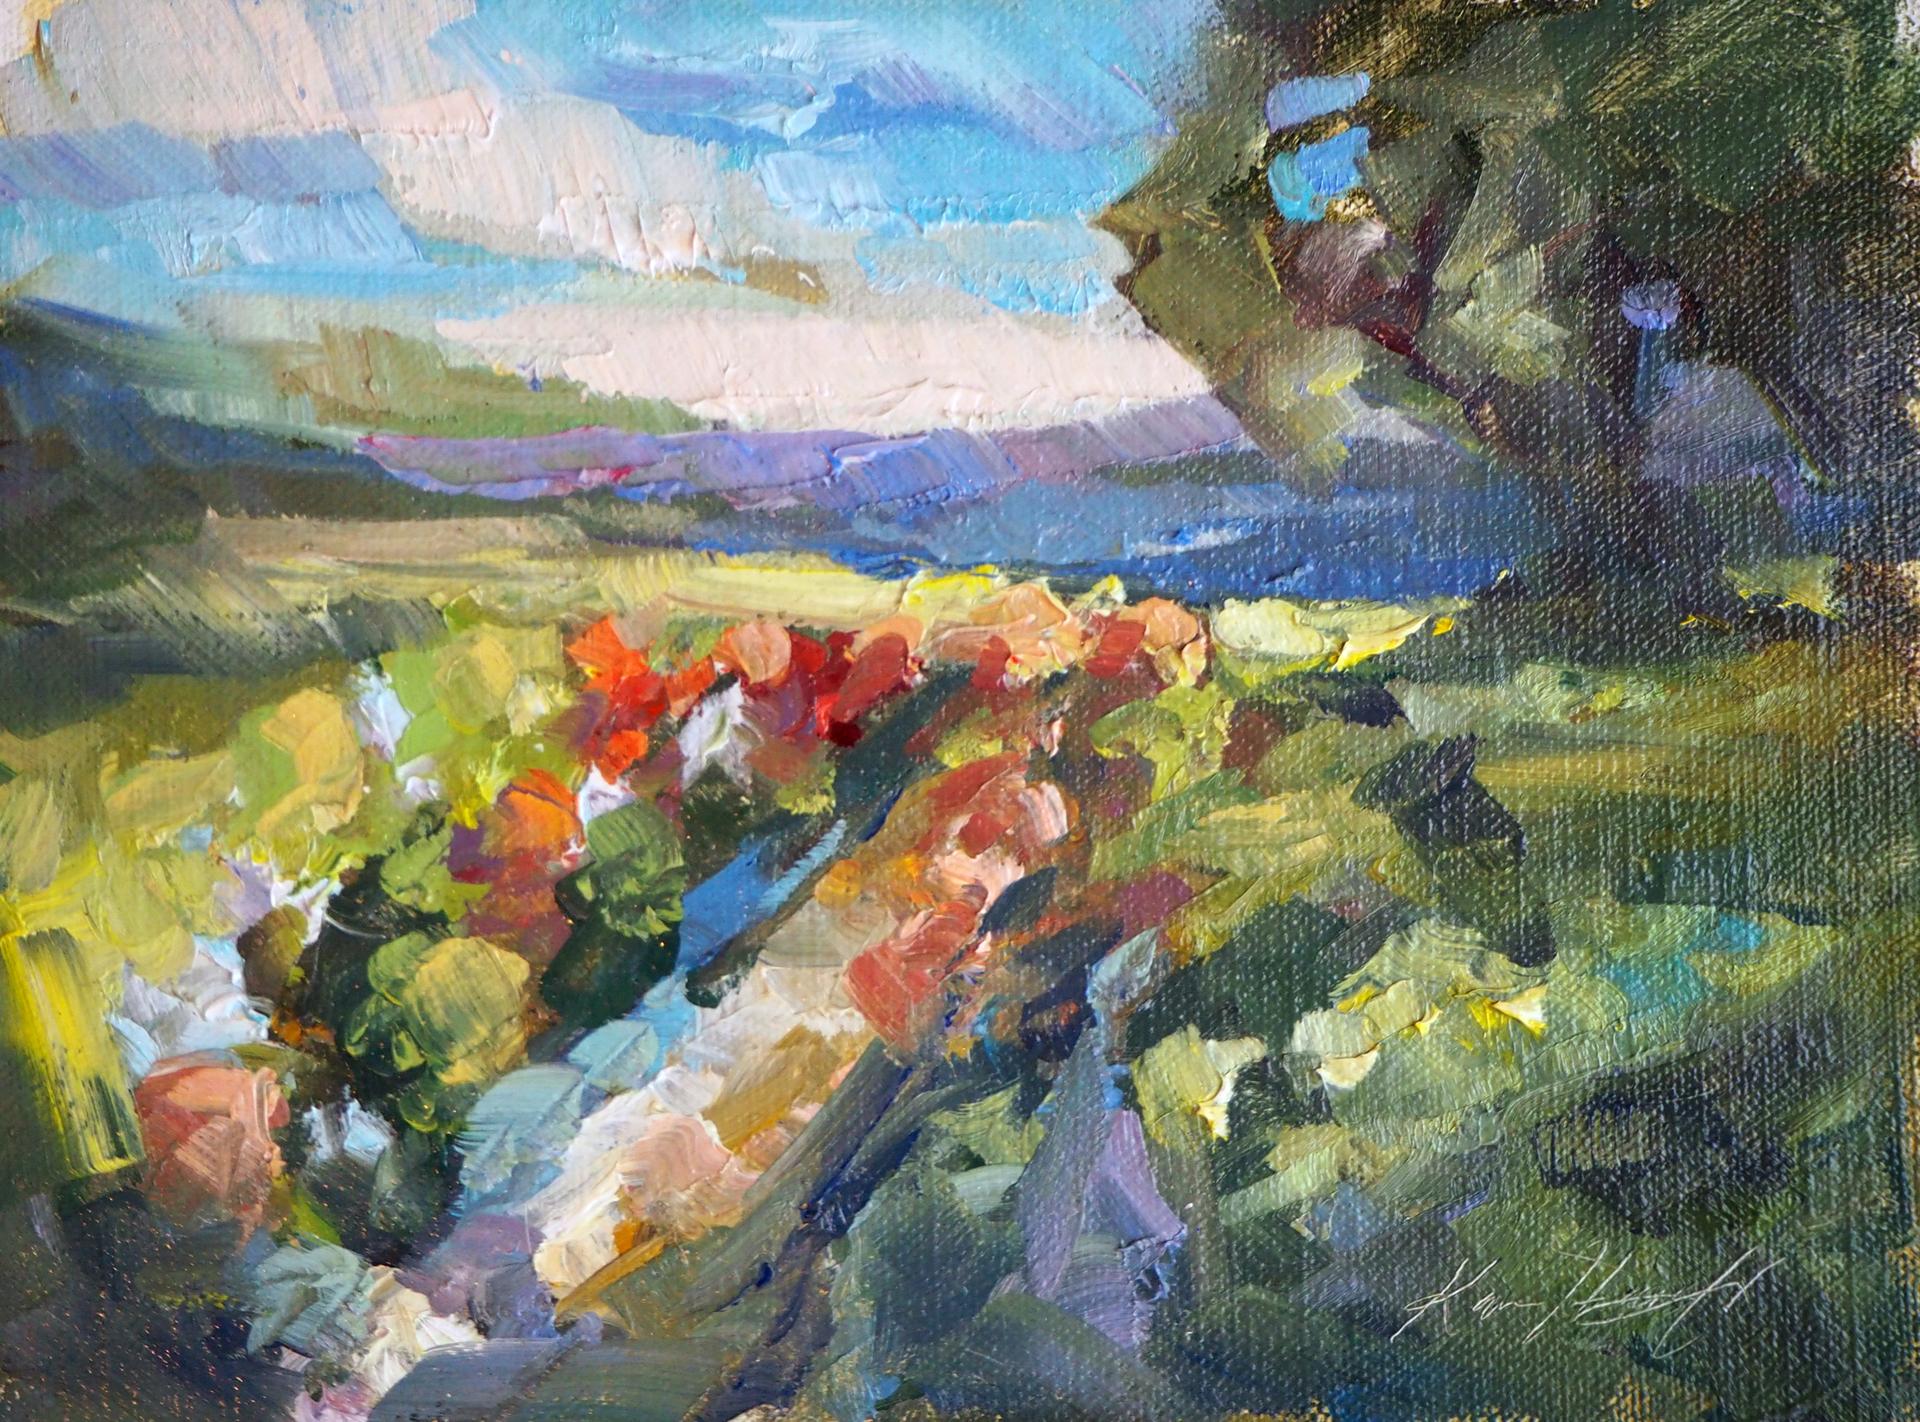 Flower Farms in Spring by Karen Hewitt Hagan